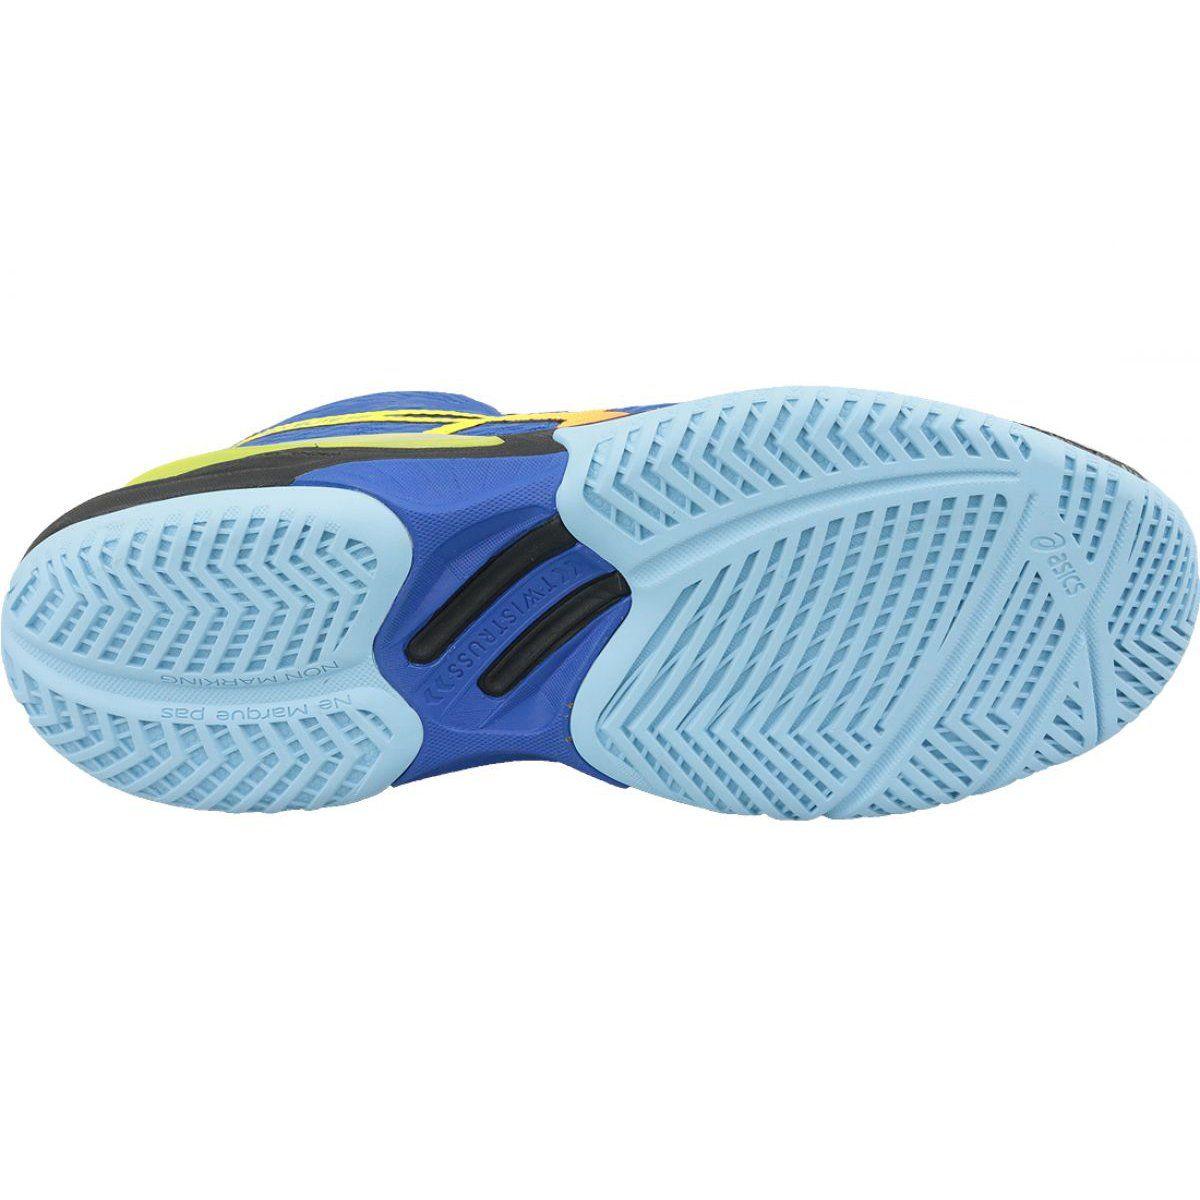 Buty Do Siatkowki Asics Sky Elite Ff Mt M 1051a032 400 Niebieskie Niebieskie Volleyball Shoes Asics Mens Volleyball Shoes